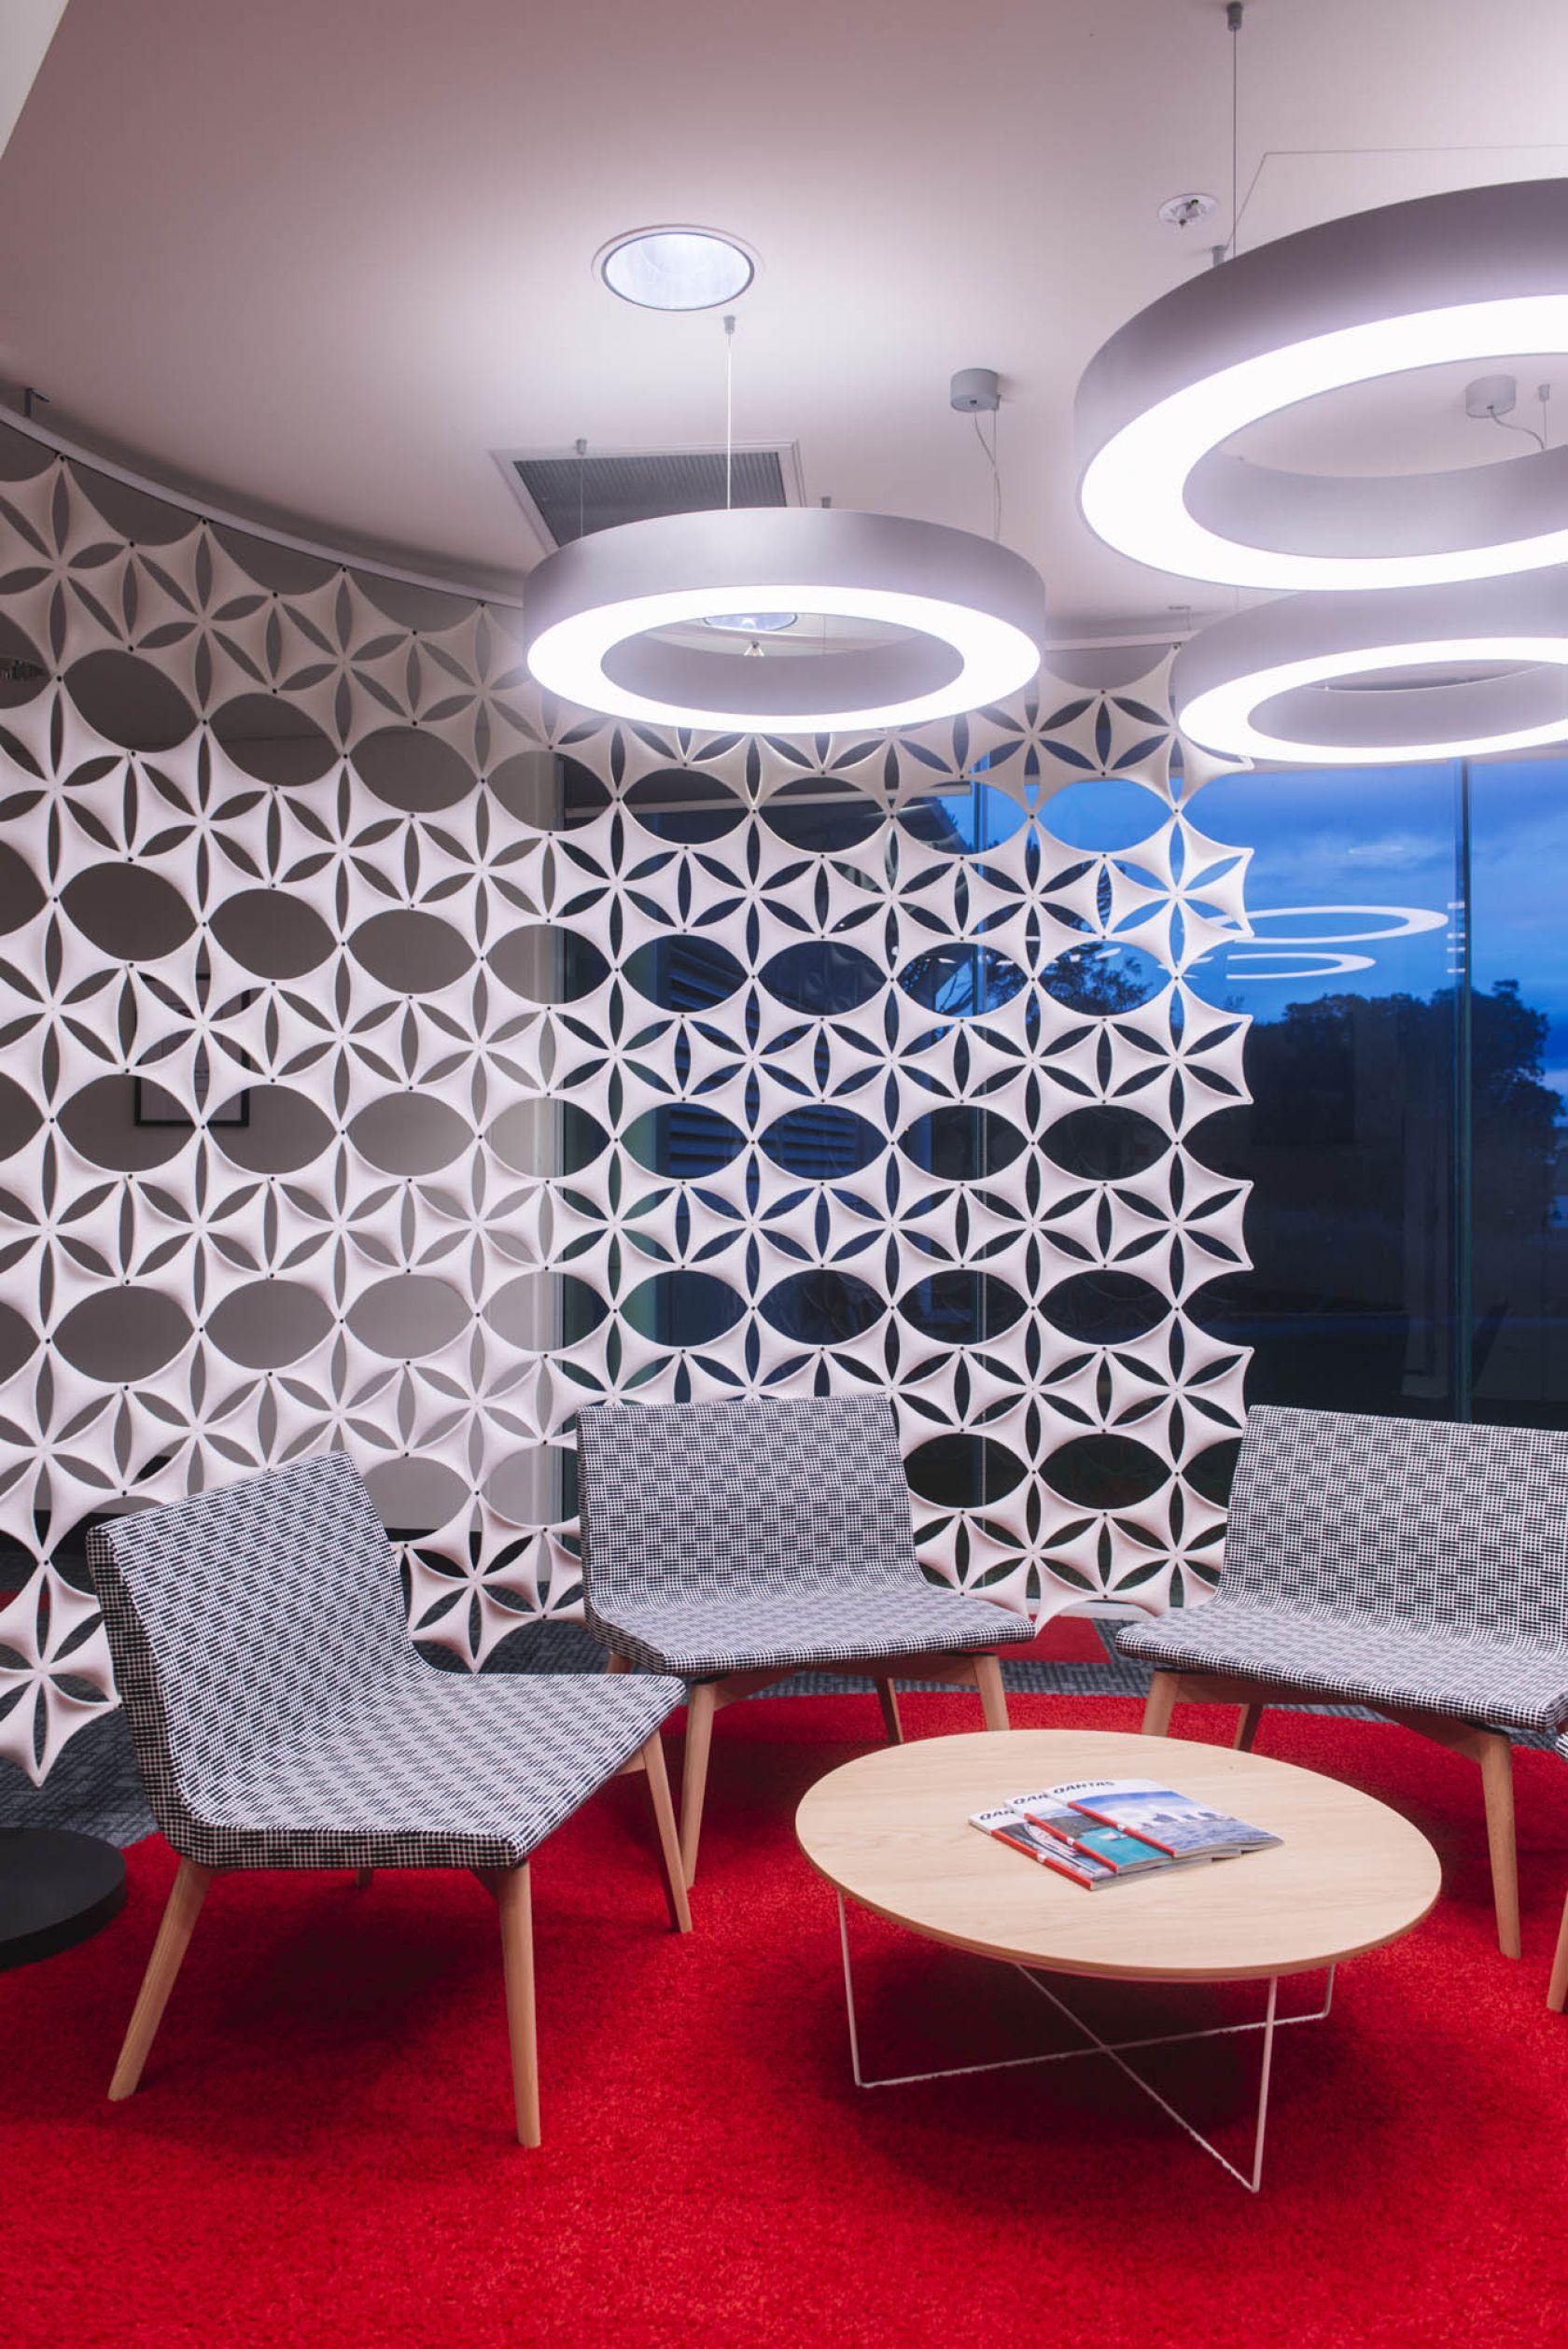 qantas hobart office fitout waiting area